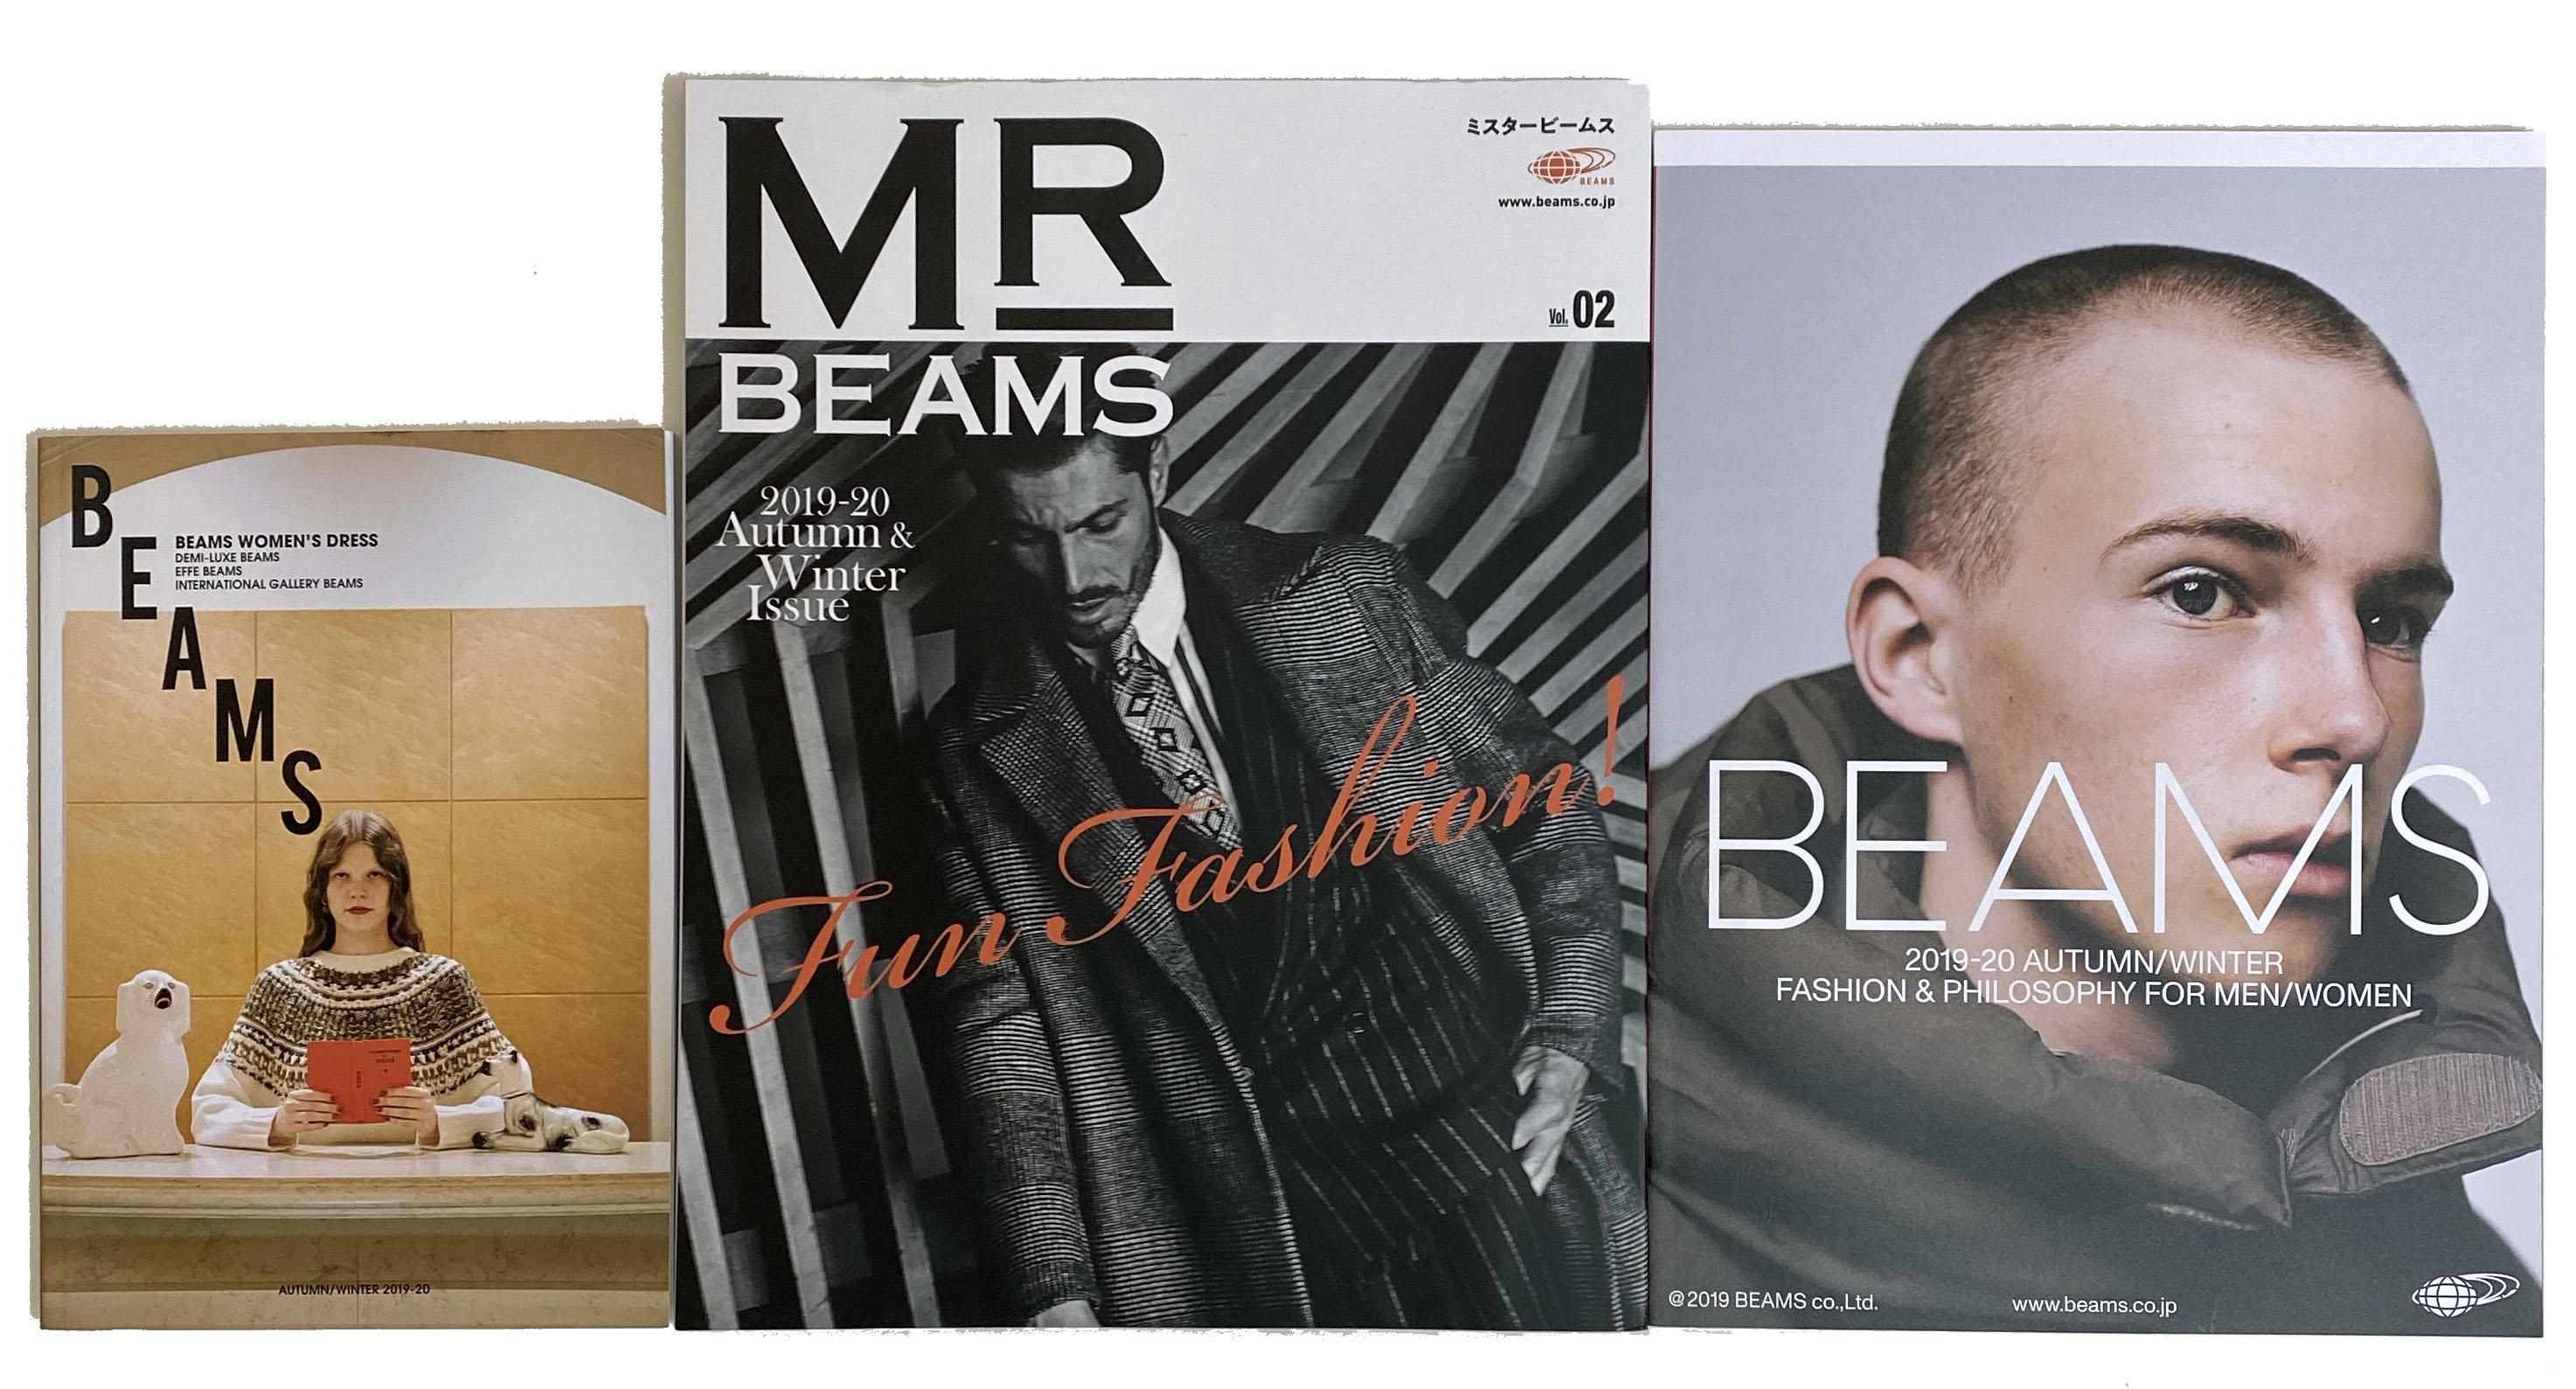 BEAMS 2019-20 AUTUM/WINTER FASHION & PHILOSOPHY FOE MEN/ WOMEN